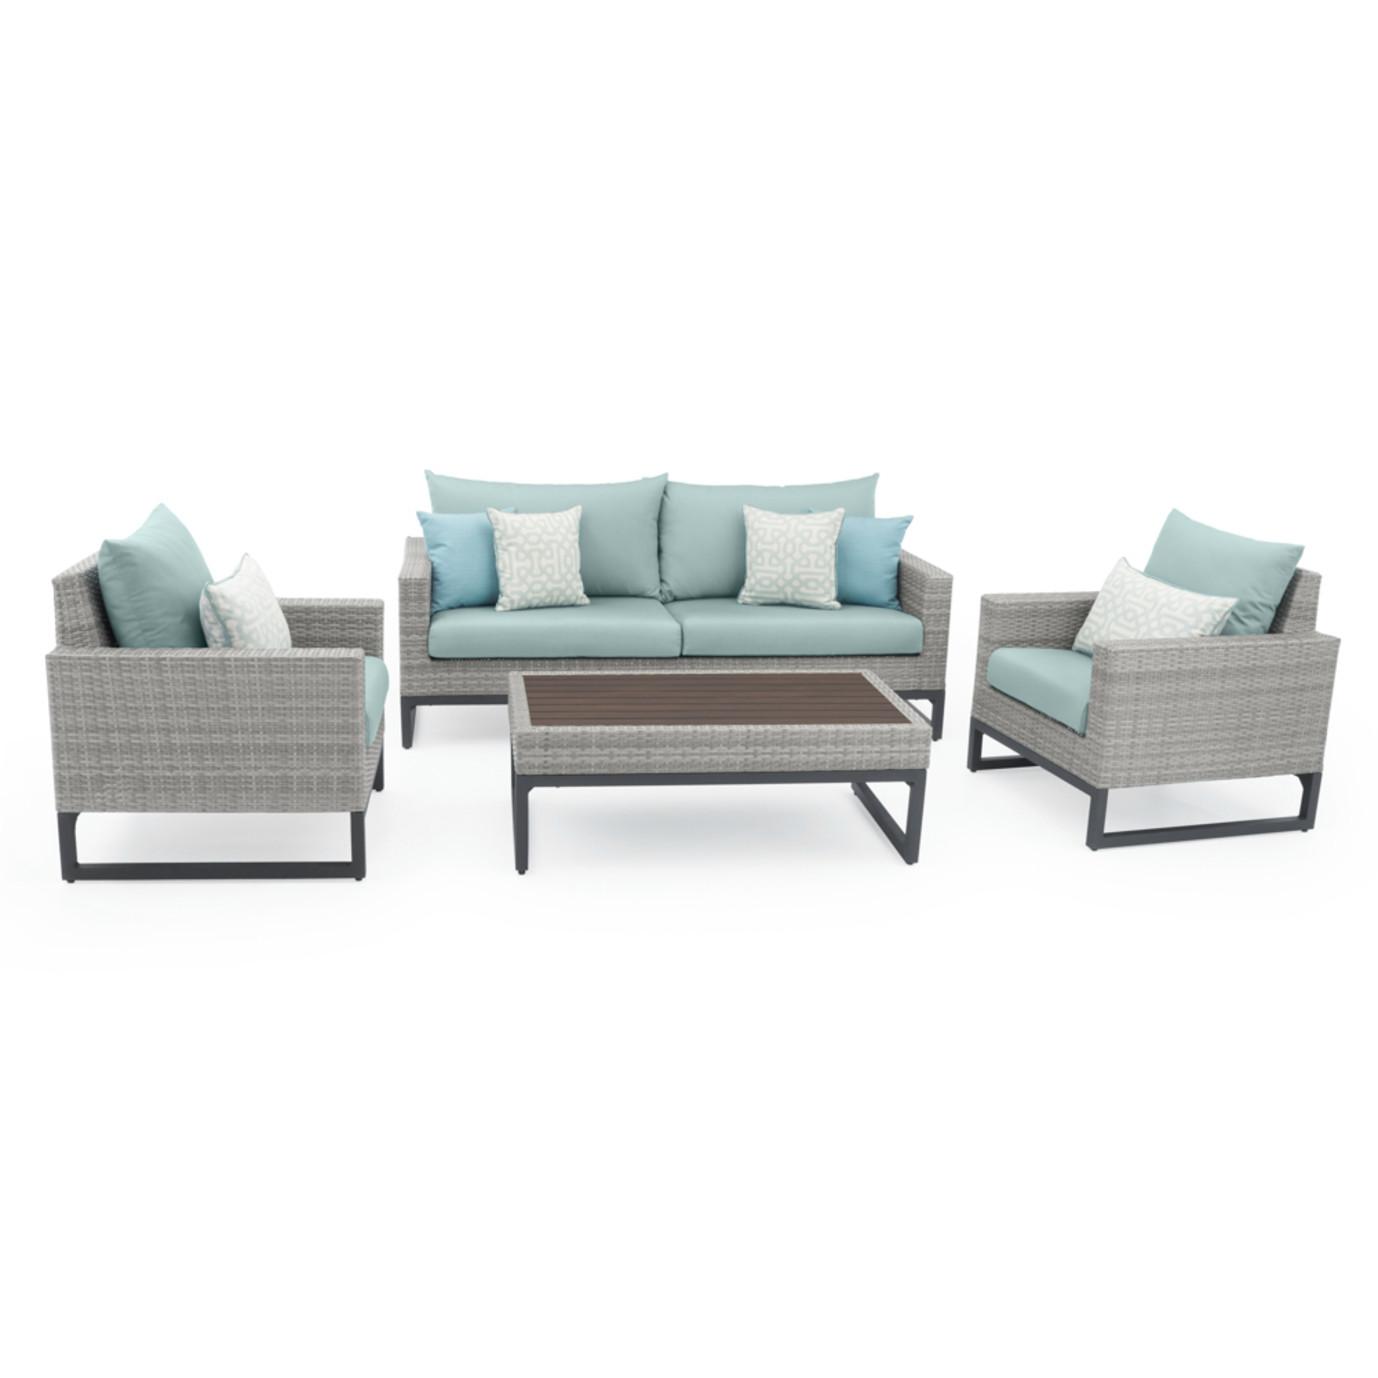 Milo™ Gray 4pc Seating Set - Spa Blue